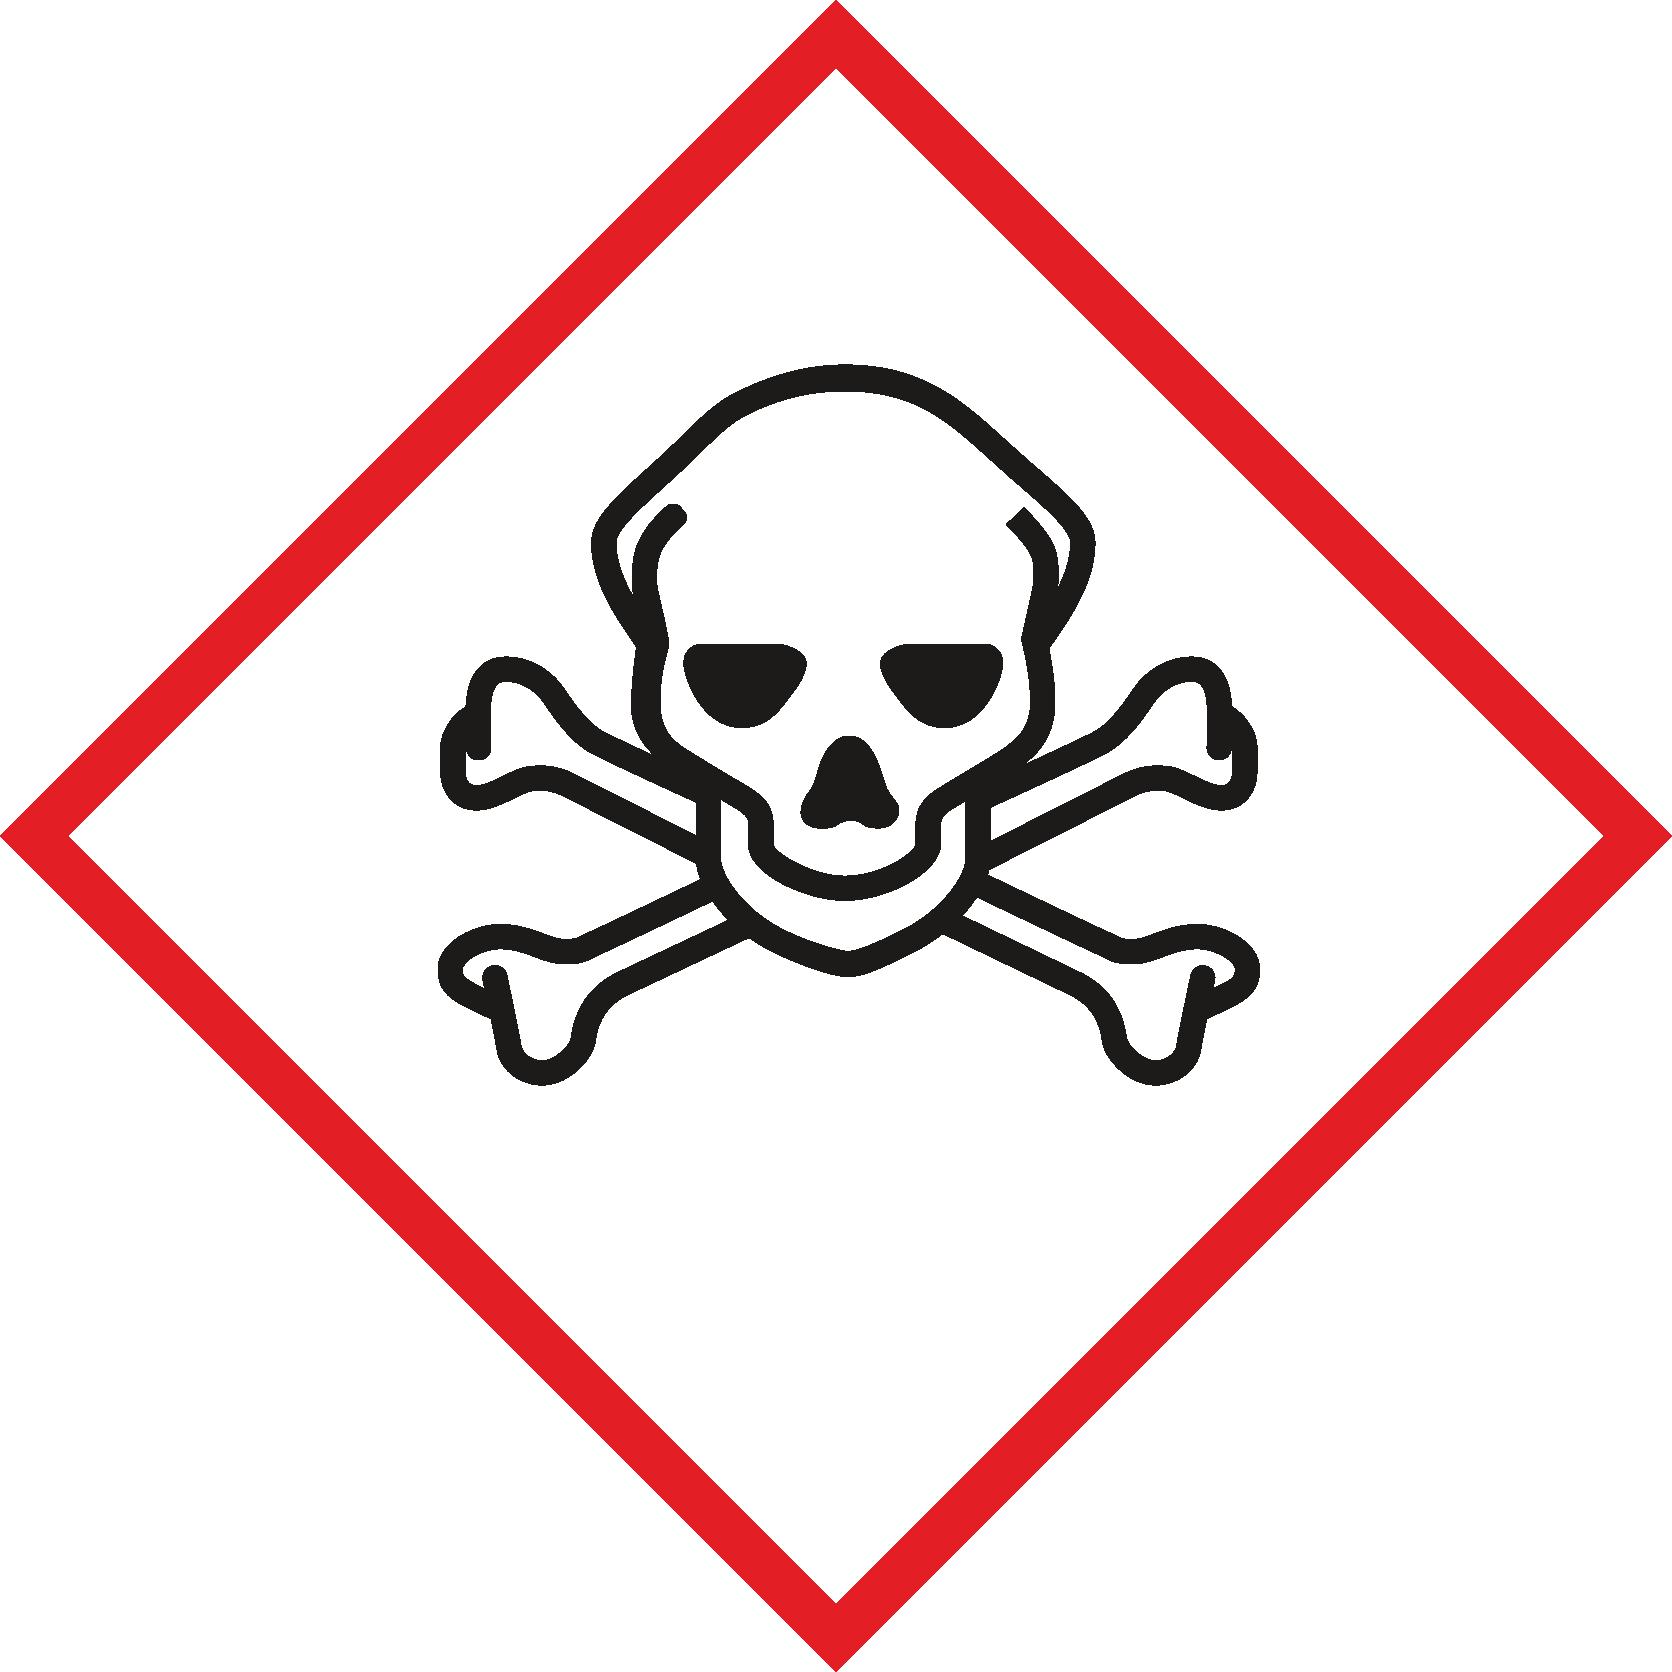 Gefahrhinweis